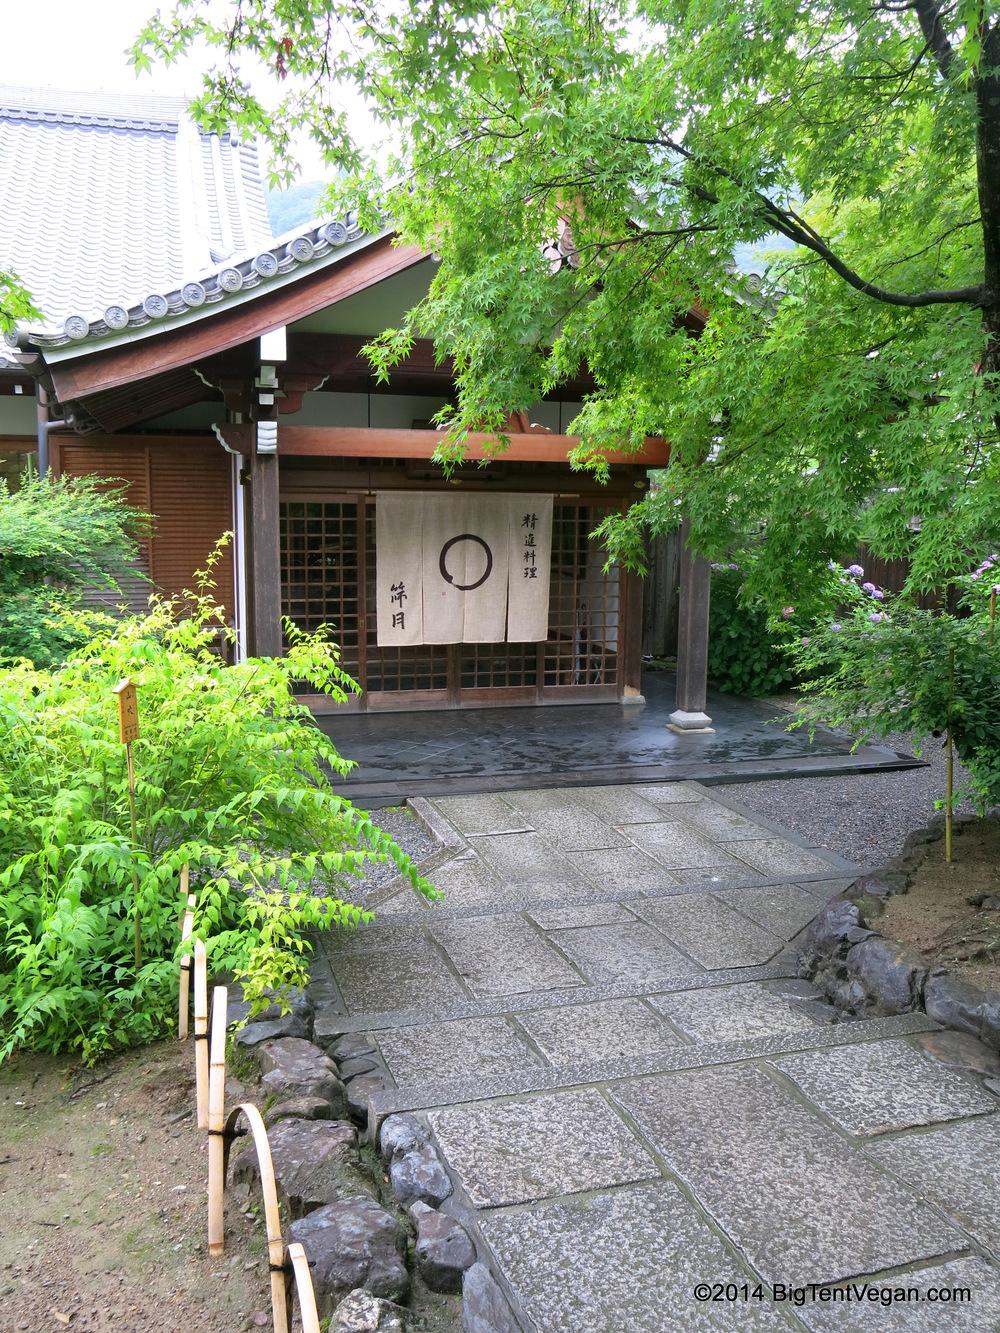 Entrance to Shigetsu Restaurant inside Tenryuji Gardens